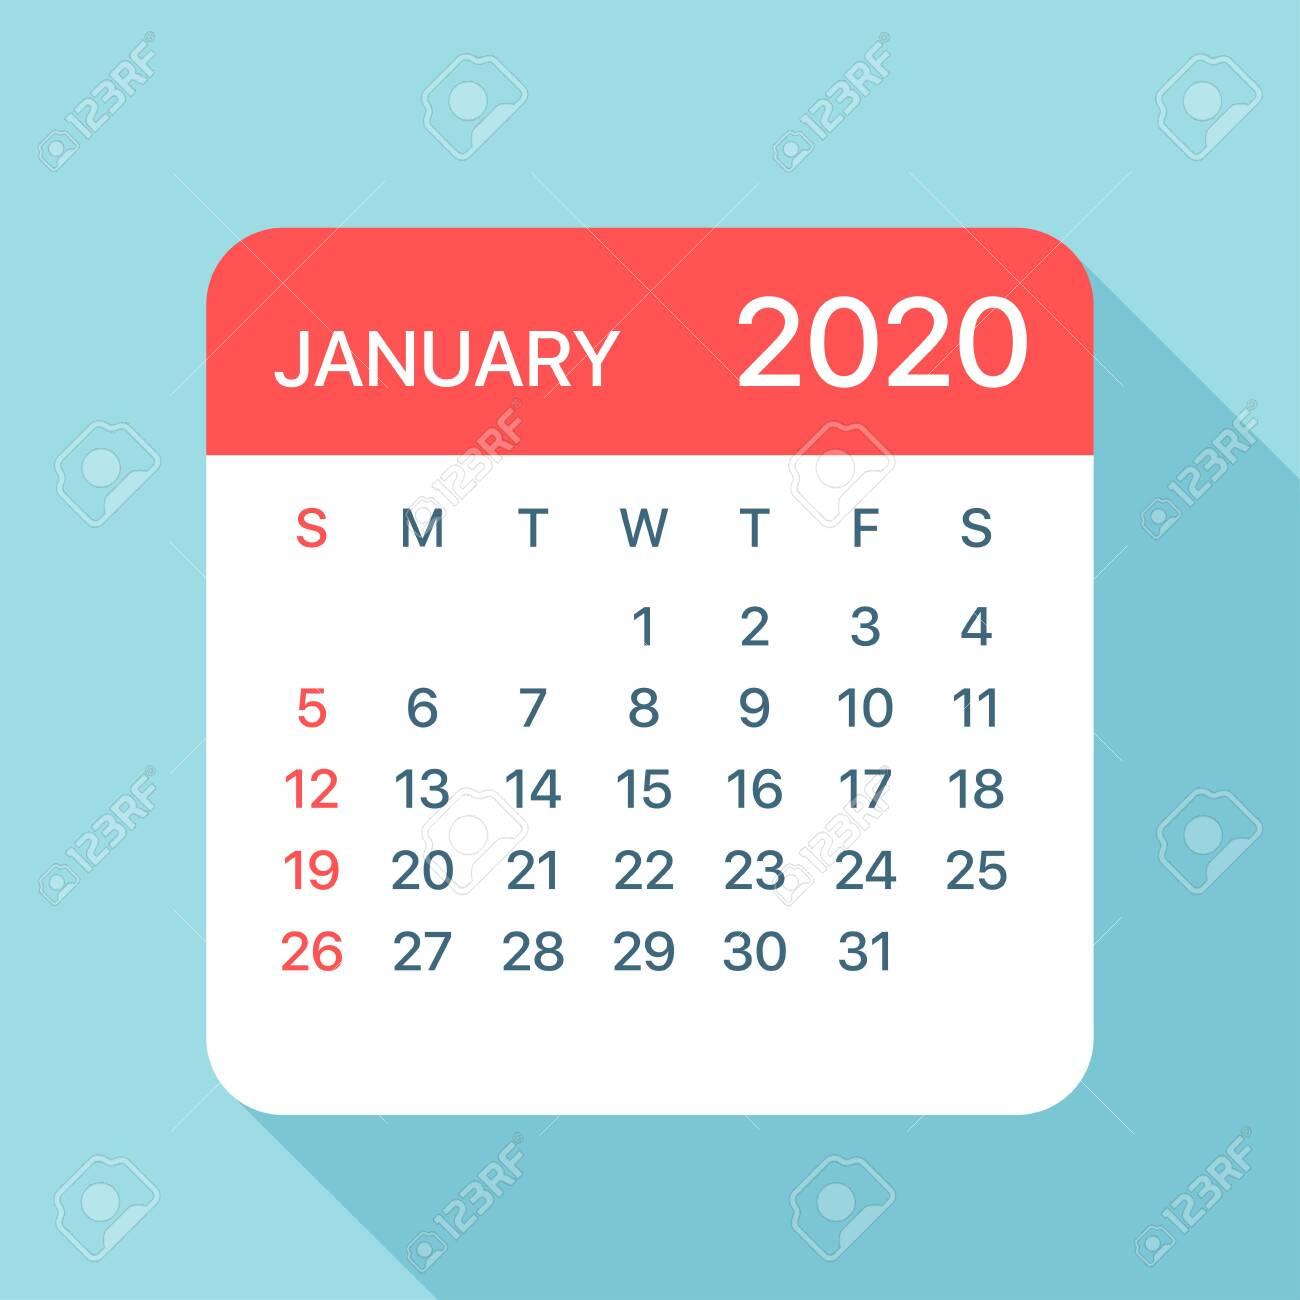 January 2020 Calendar Leaf - Illustration. Vector Graphic Page